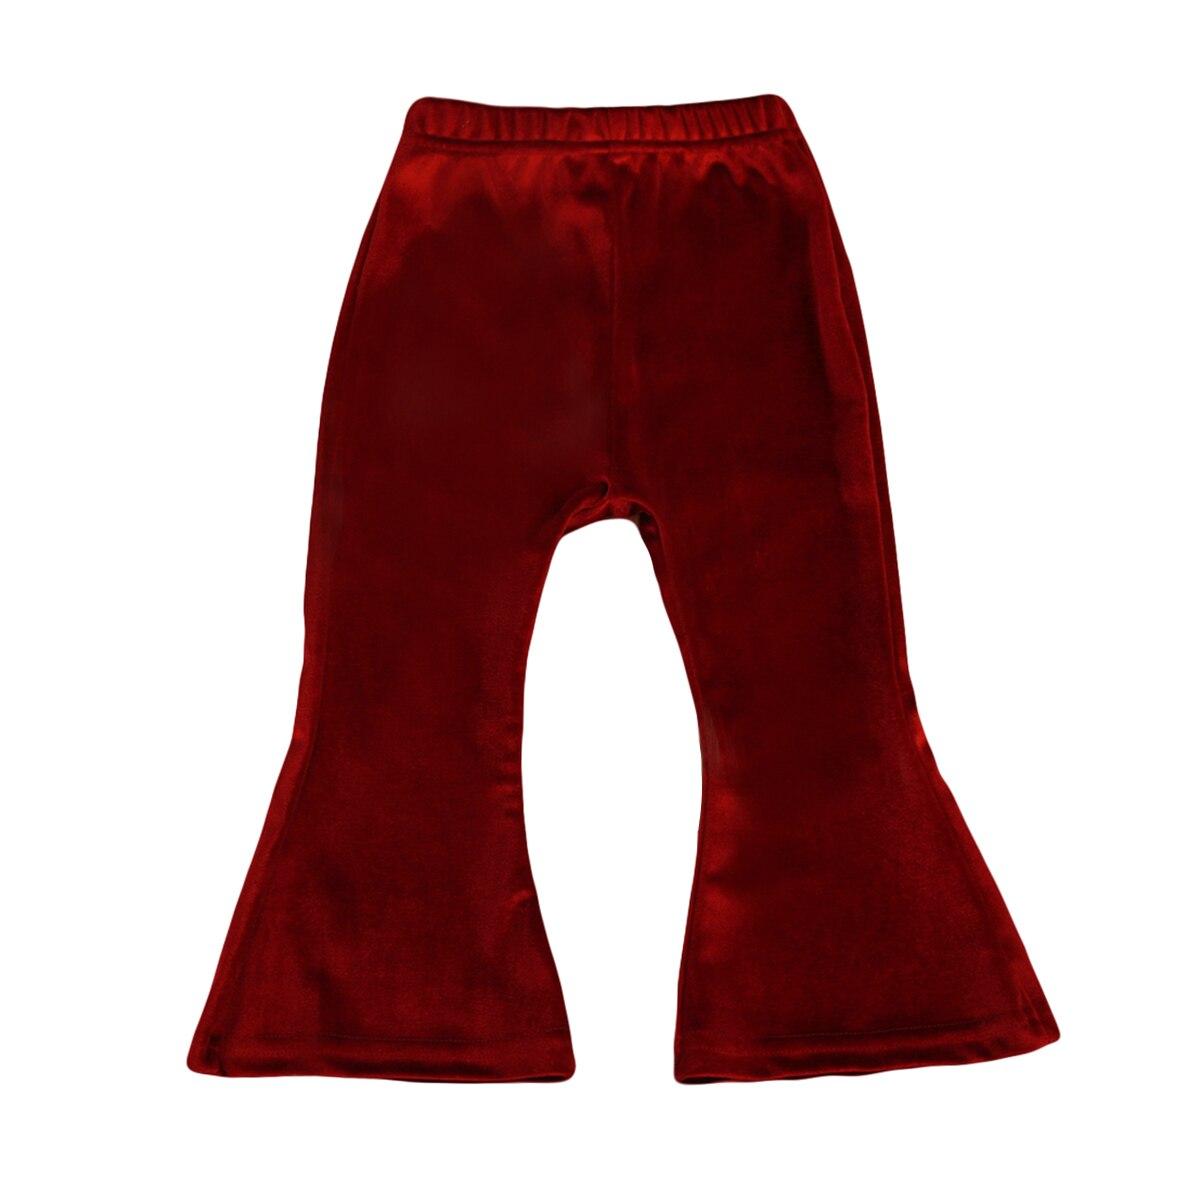 Niños bebé niñas campana inferior pierna ancha Flare estiramiento Boho pantalones largos niño Adorable bebé niña pantalones largos 1-5 y